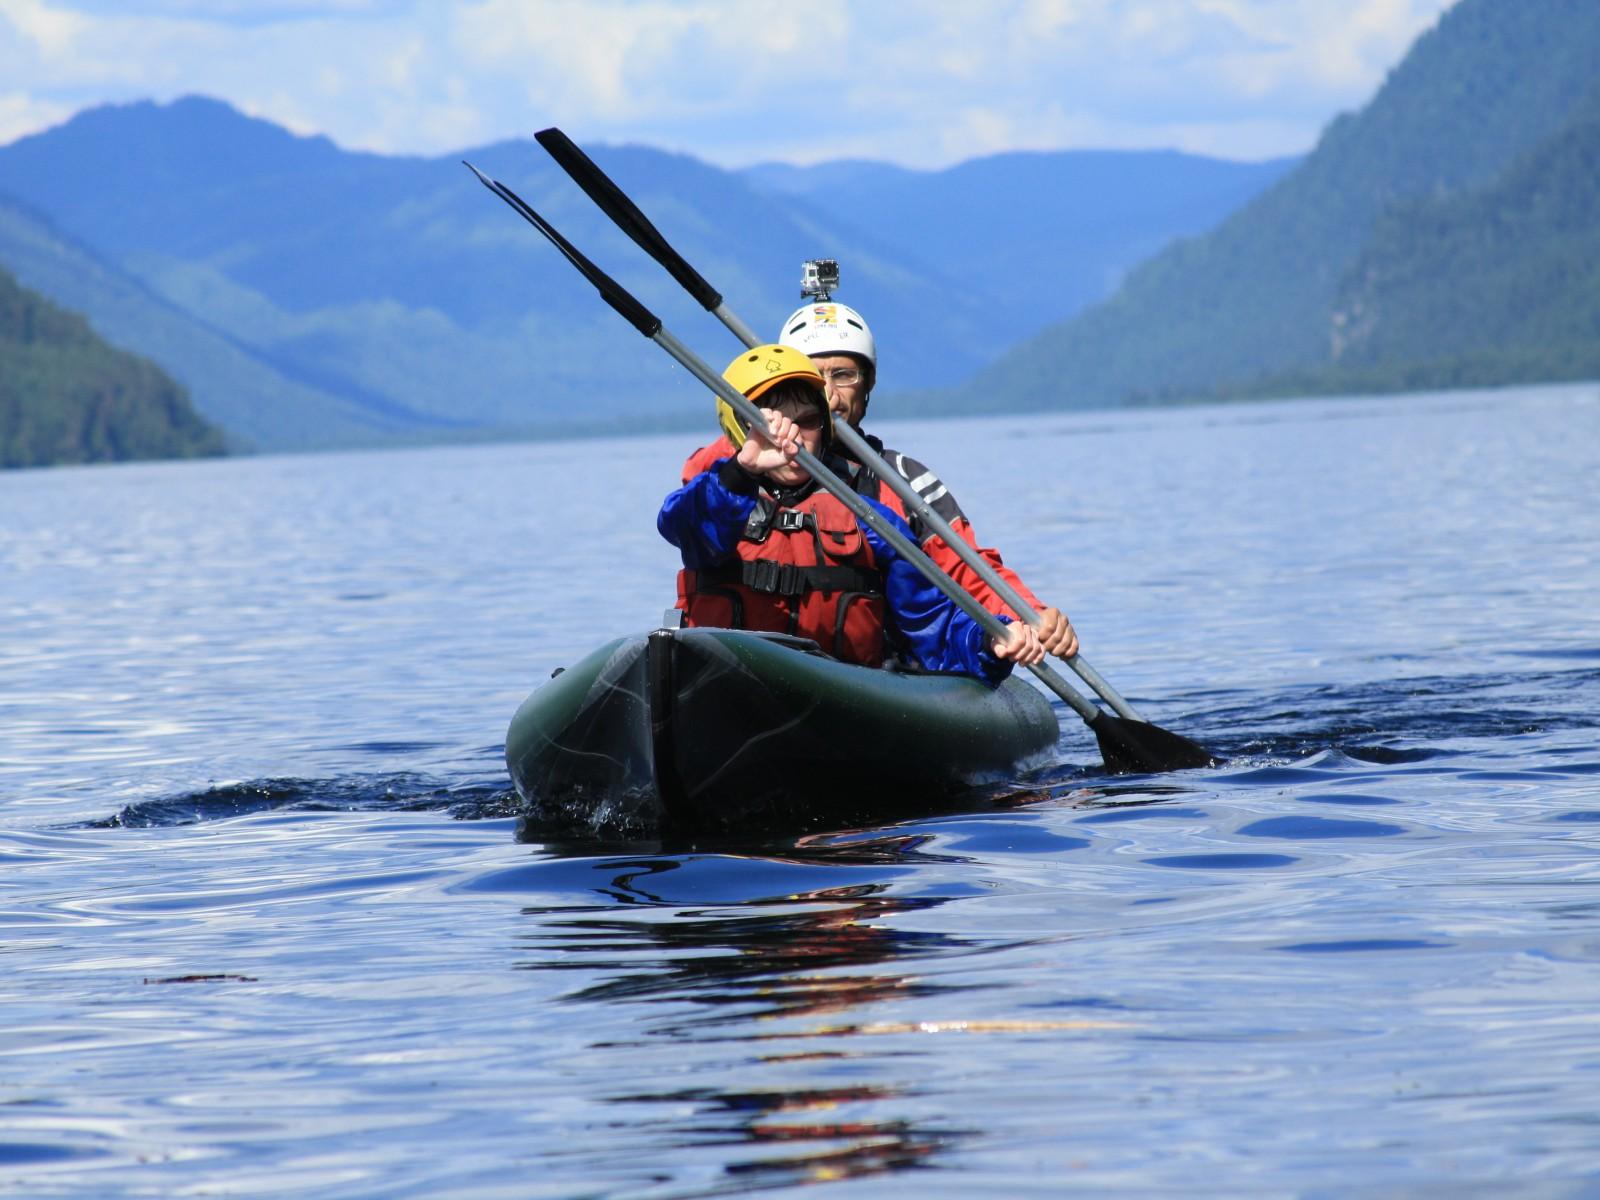 автотуризм на телецкое озеро